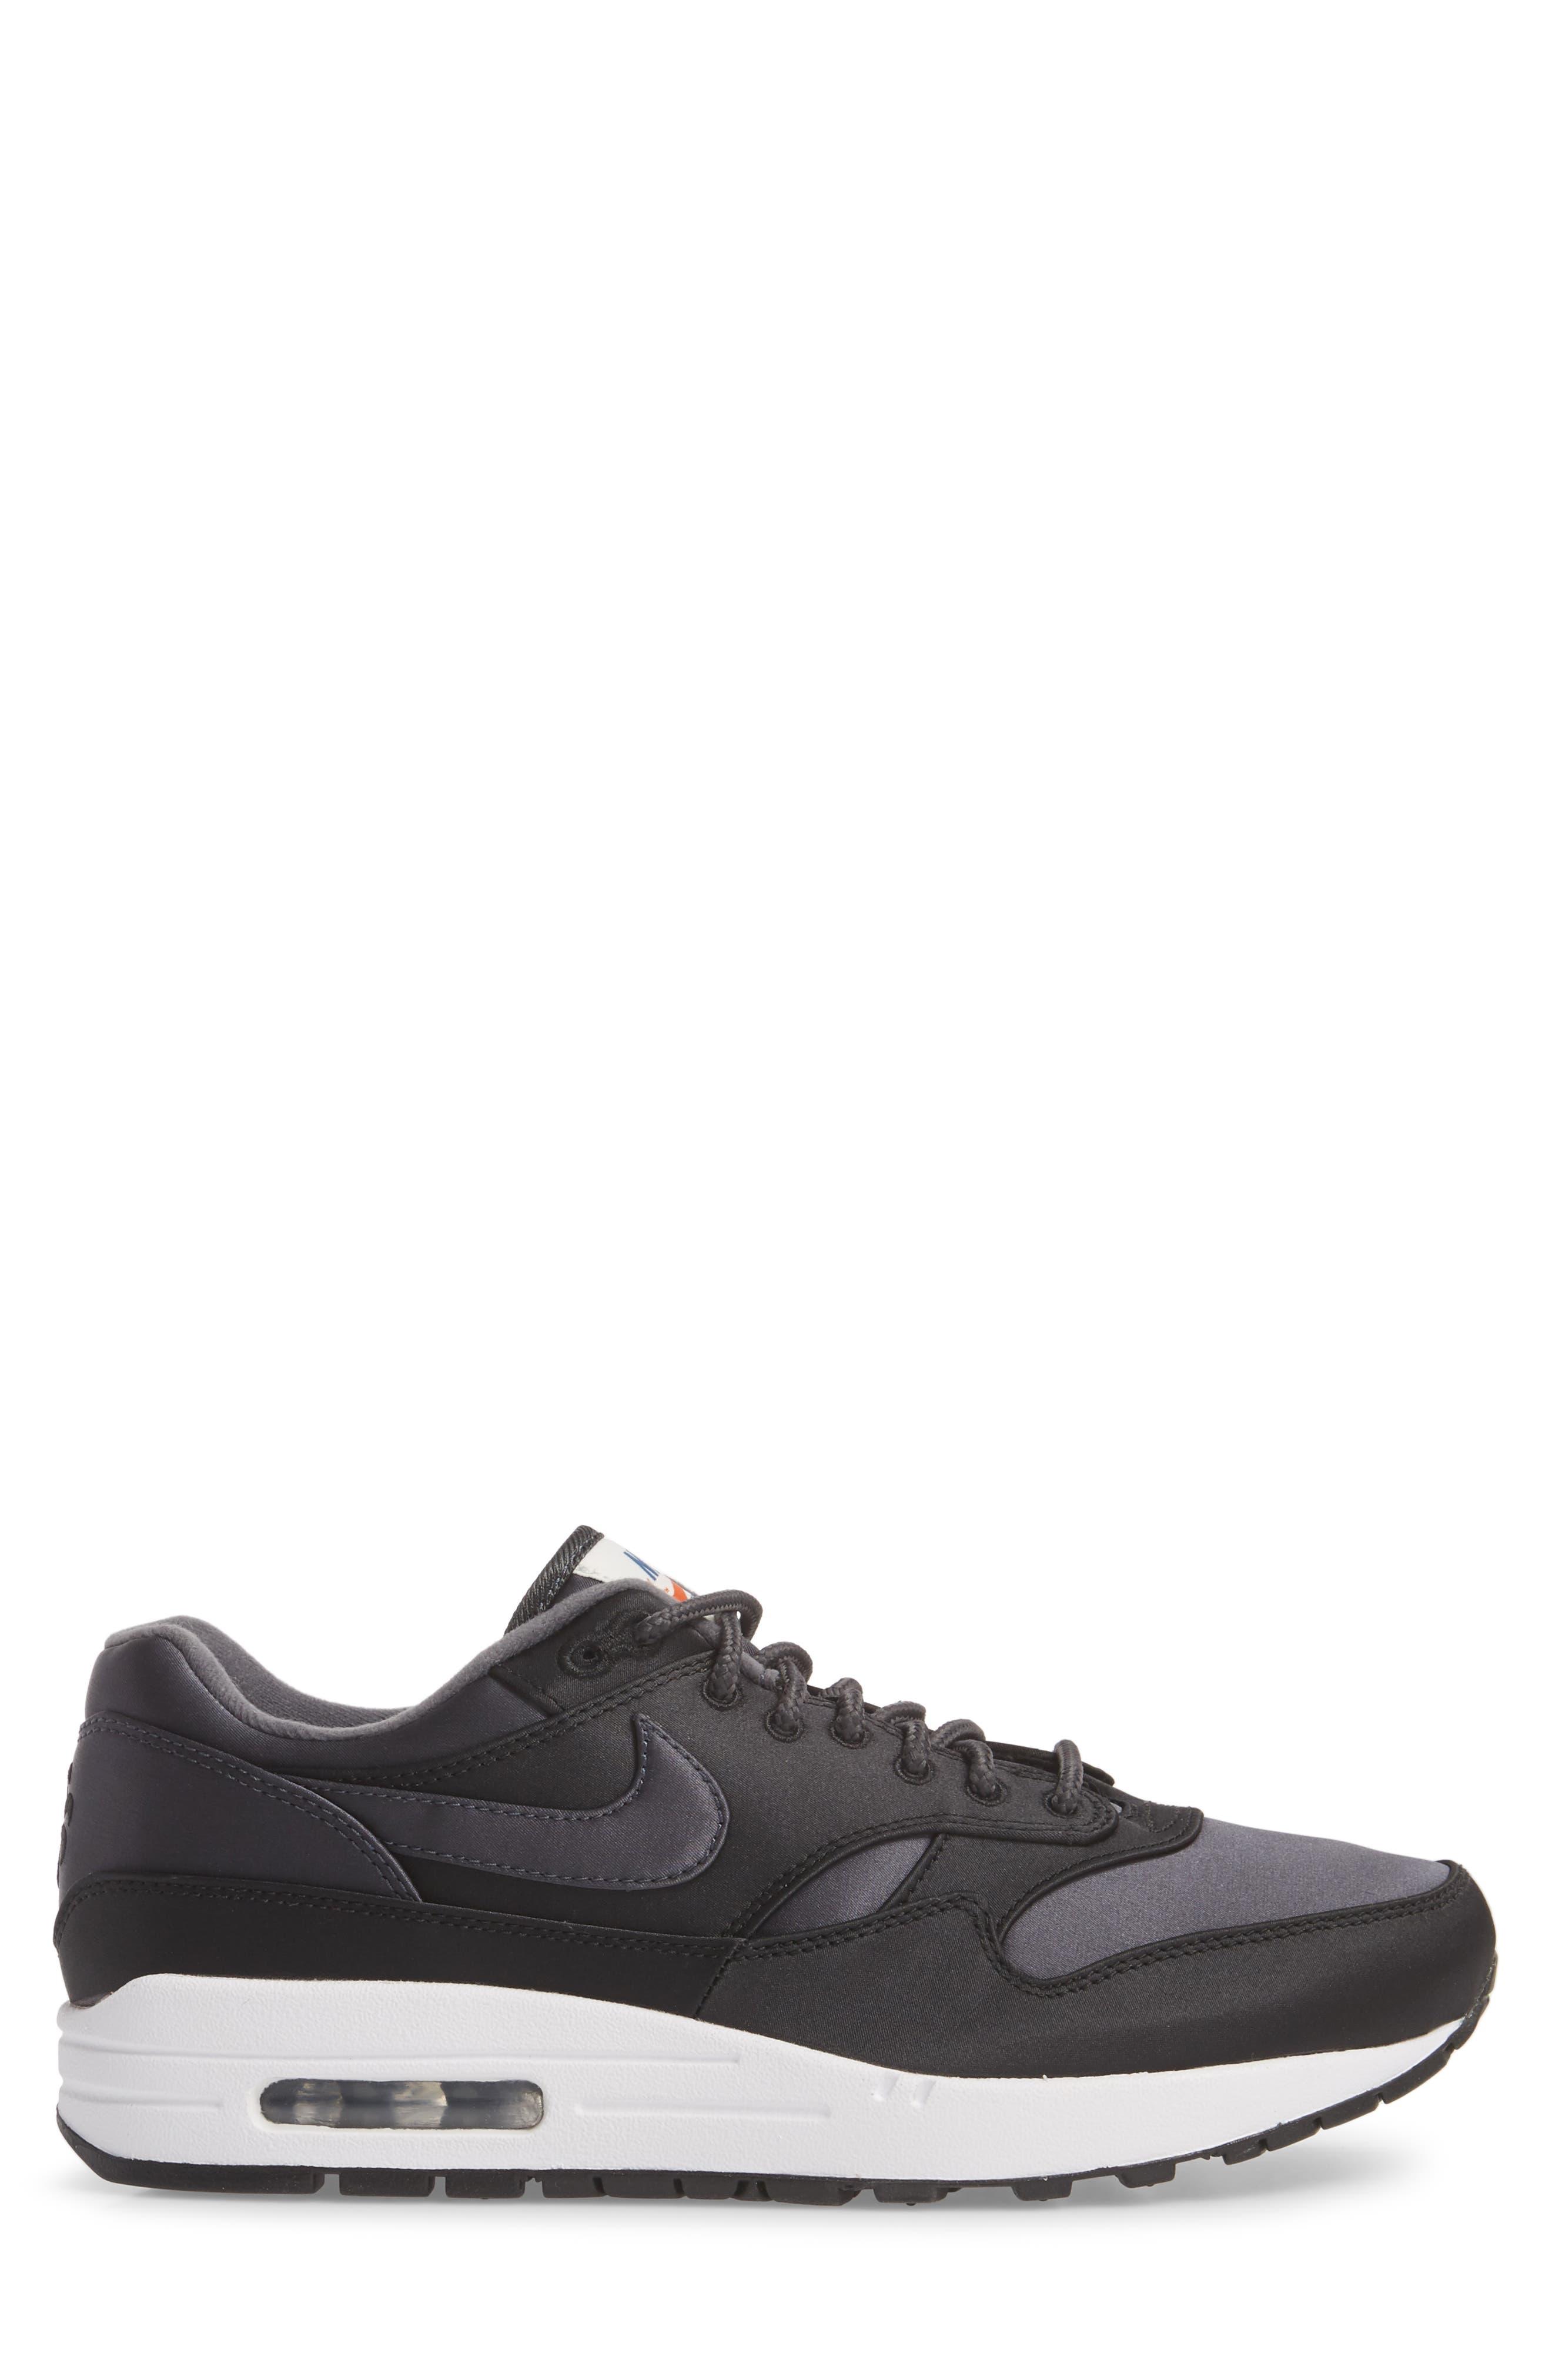 Air Max 1 SE Sneaker,                             Alternate thumbnail 3, color,                             Black/ Anthracite/ White